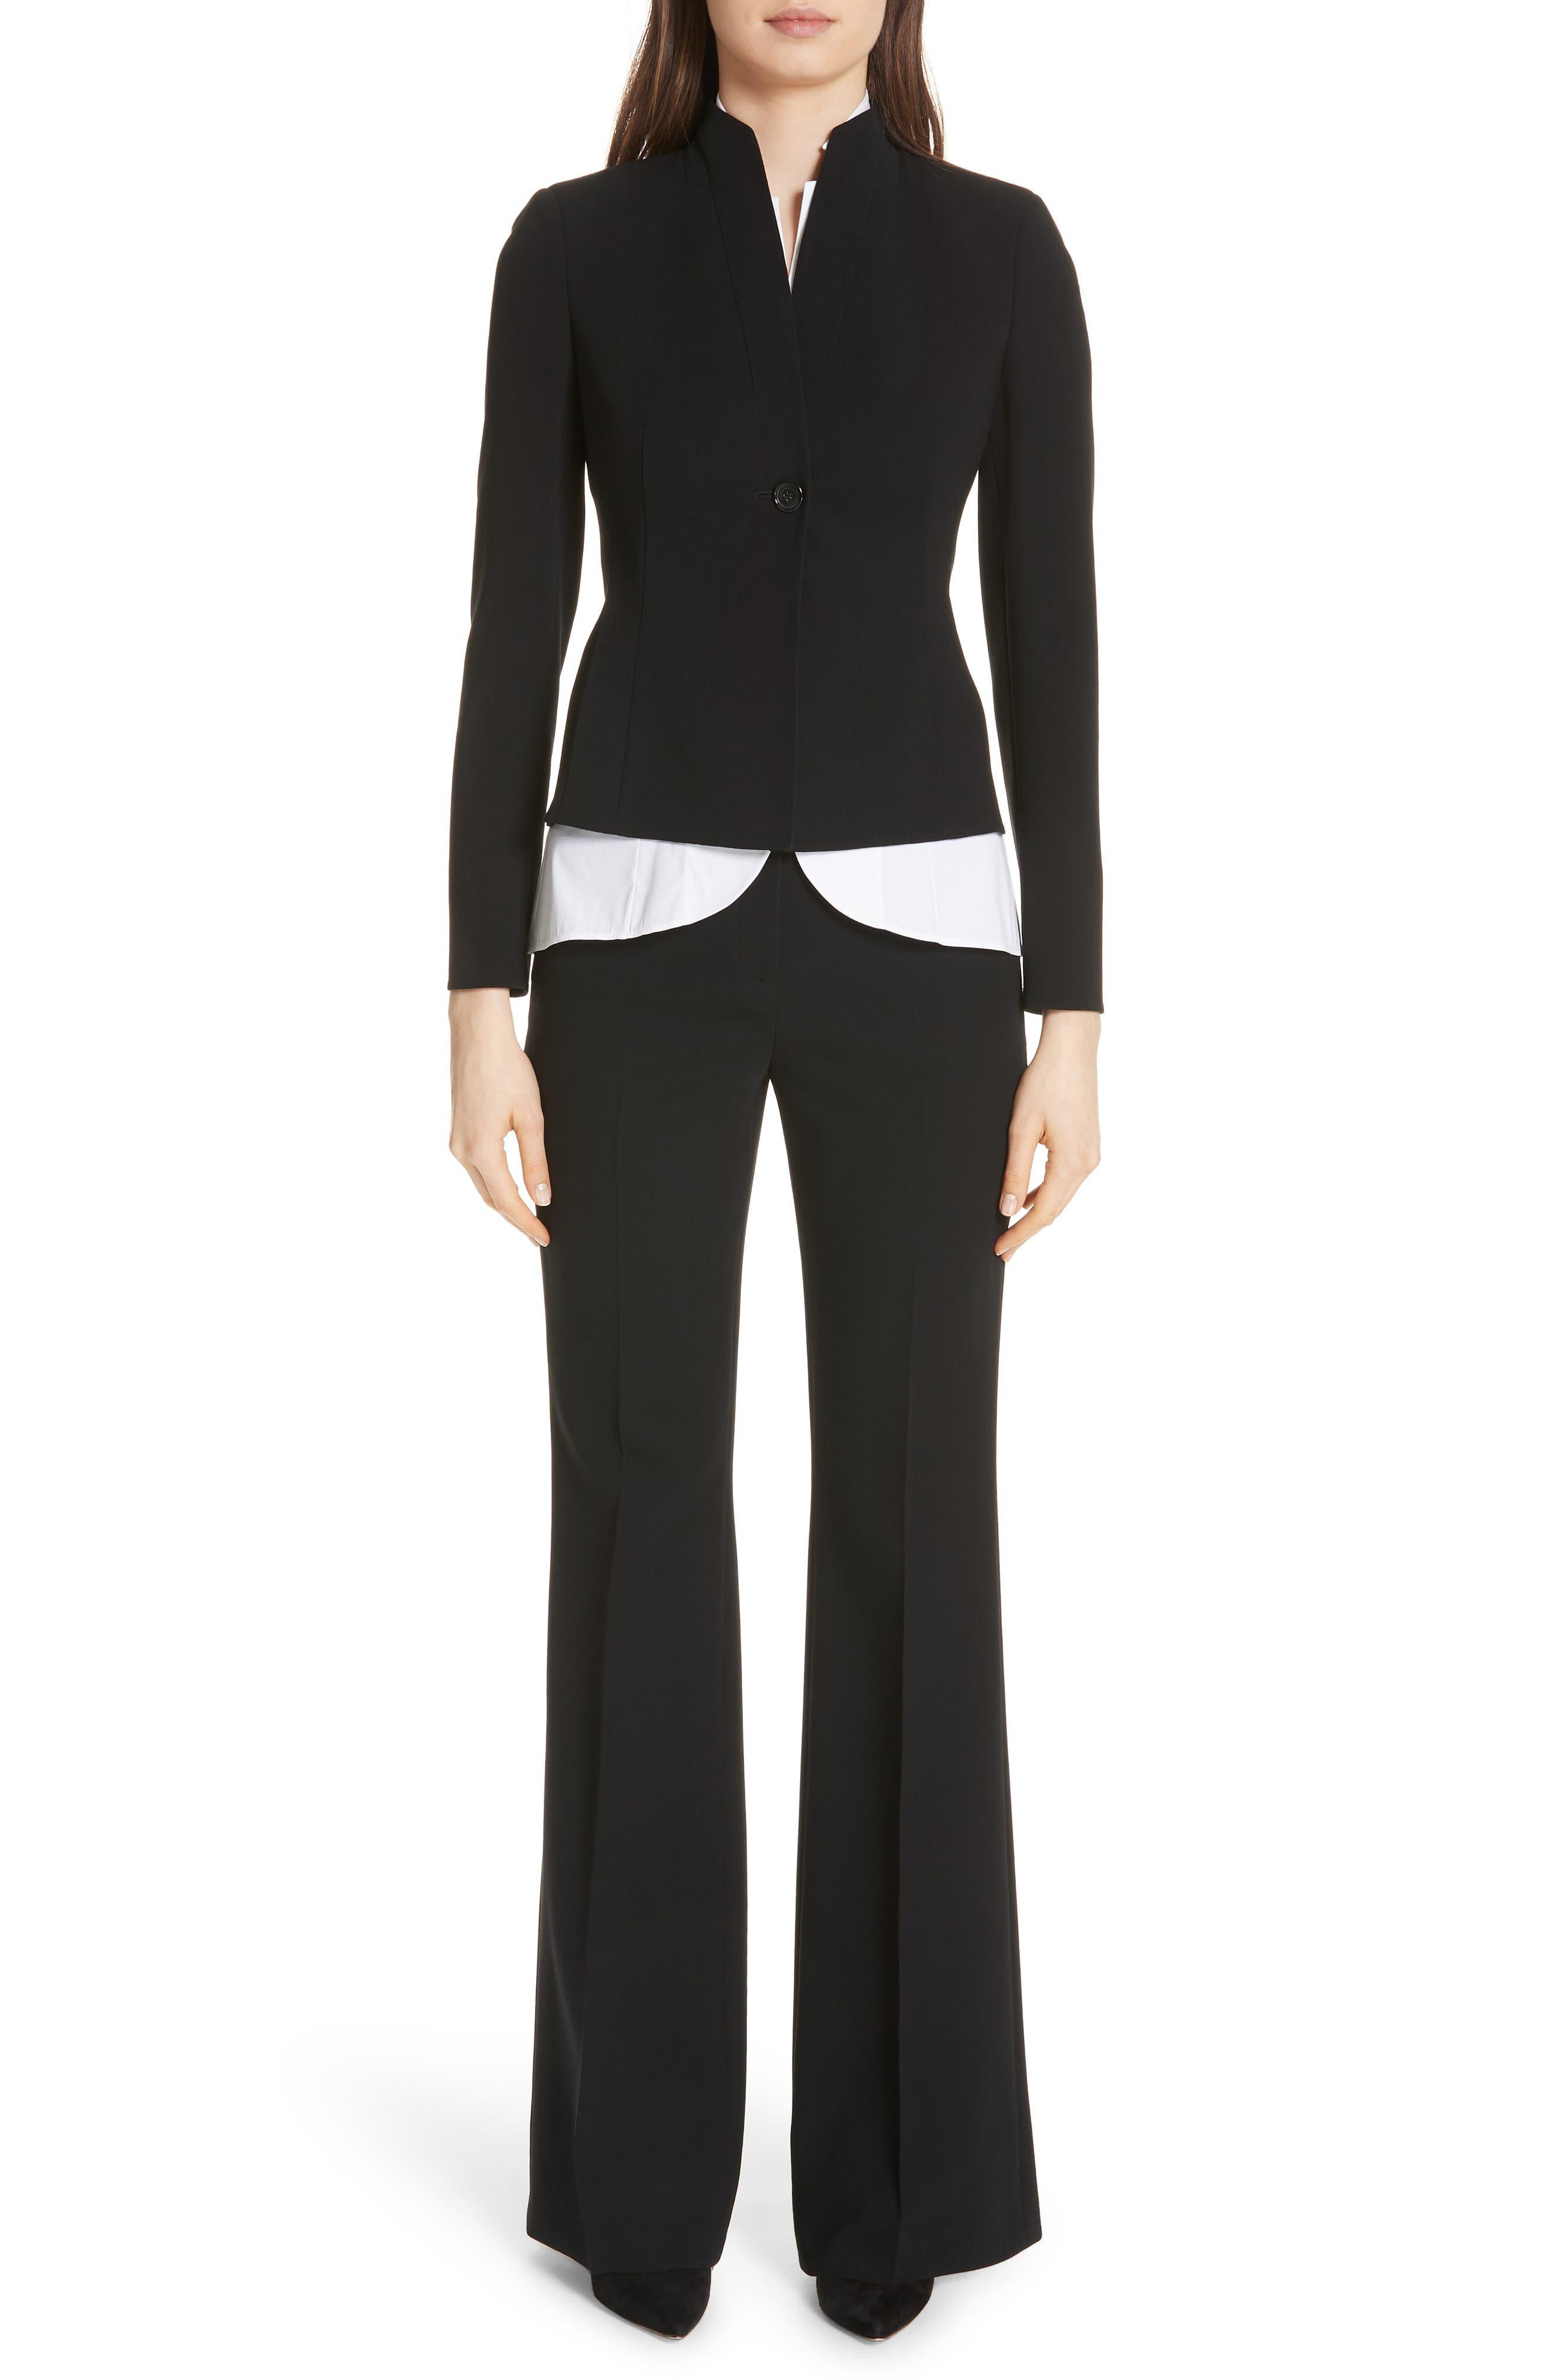 AKRIS, Farrah Stretch Wool Flare Pants, Alternate thumbnail 7, color, BLACK